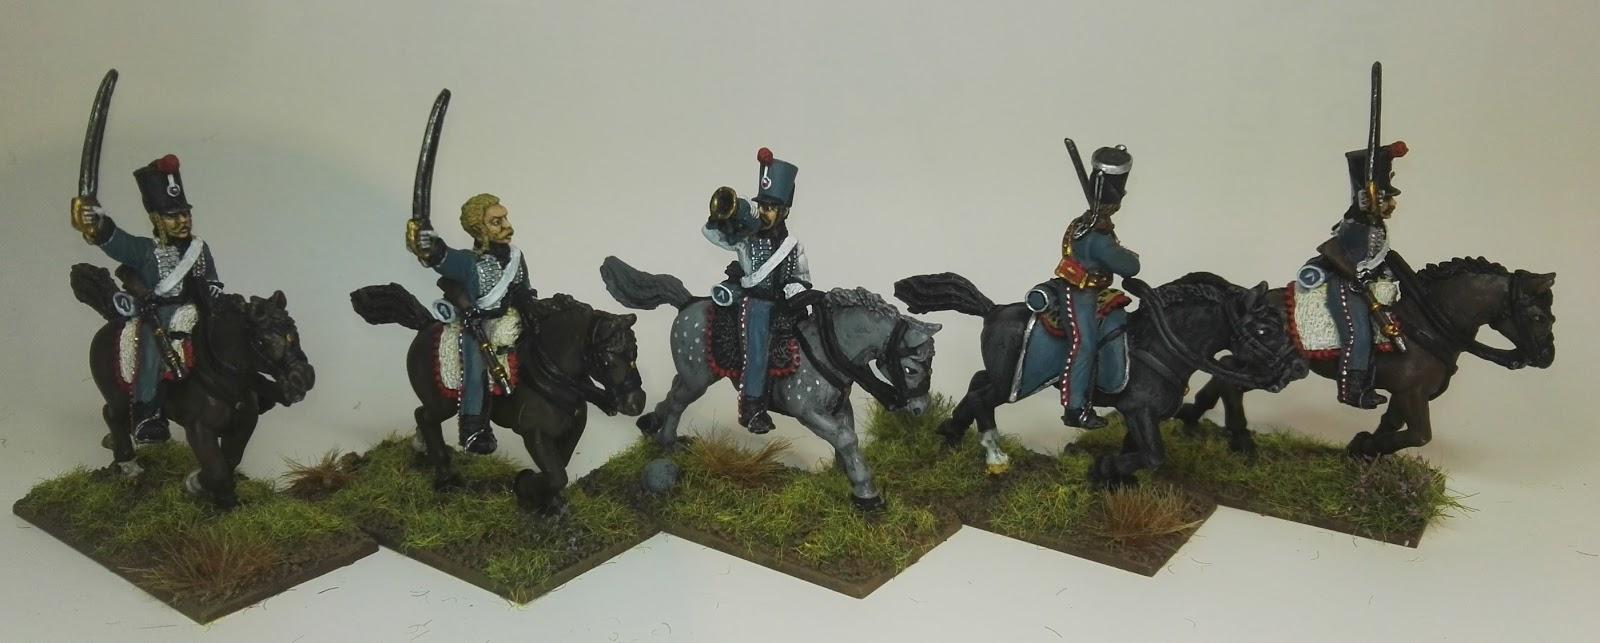 1er hussards French%2B1st%2Bhussars%2B%25286%2529